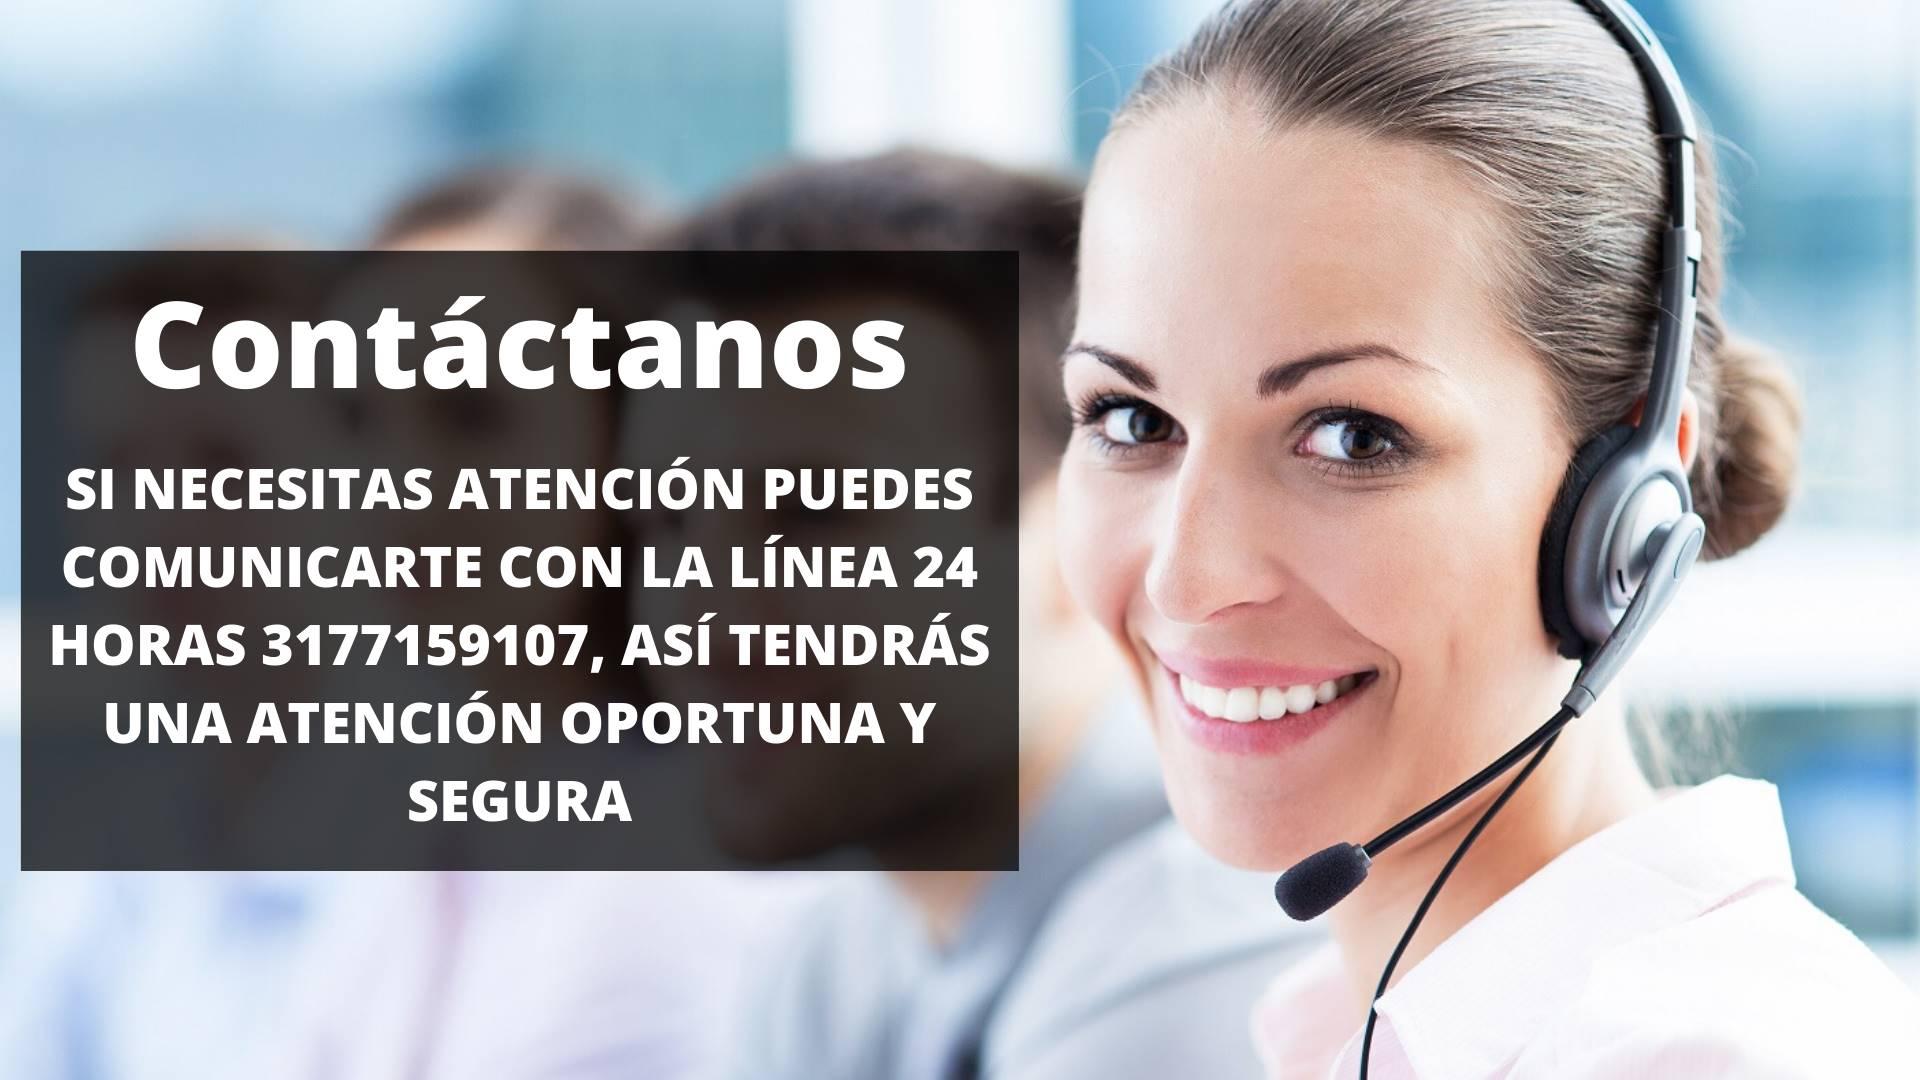 Contactanos 1